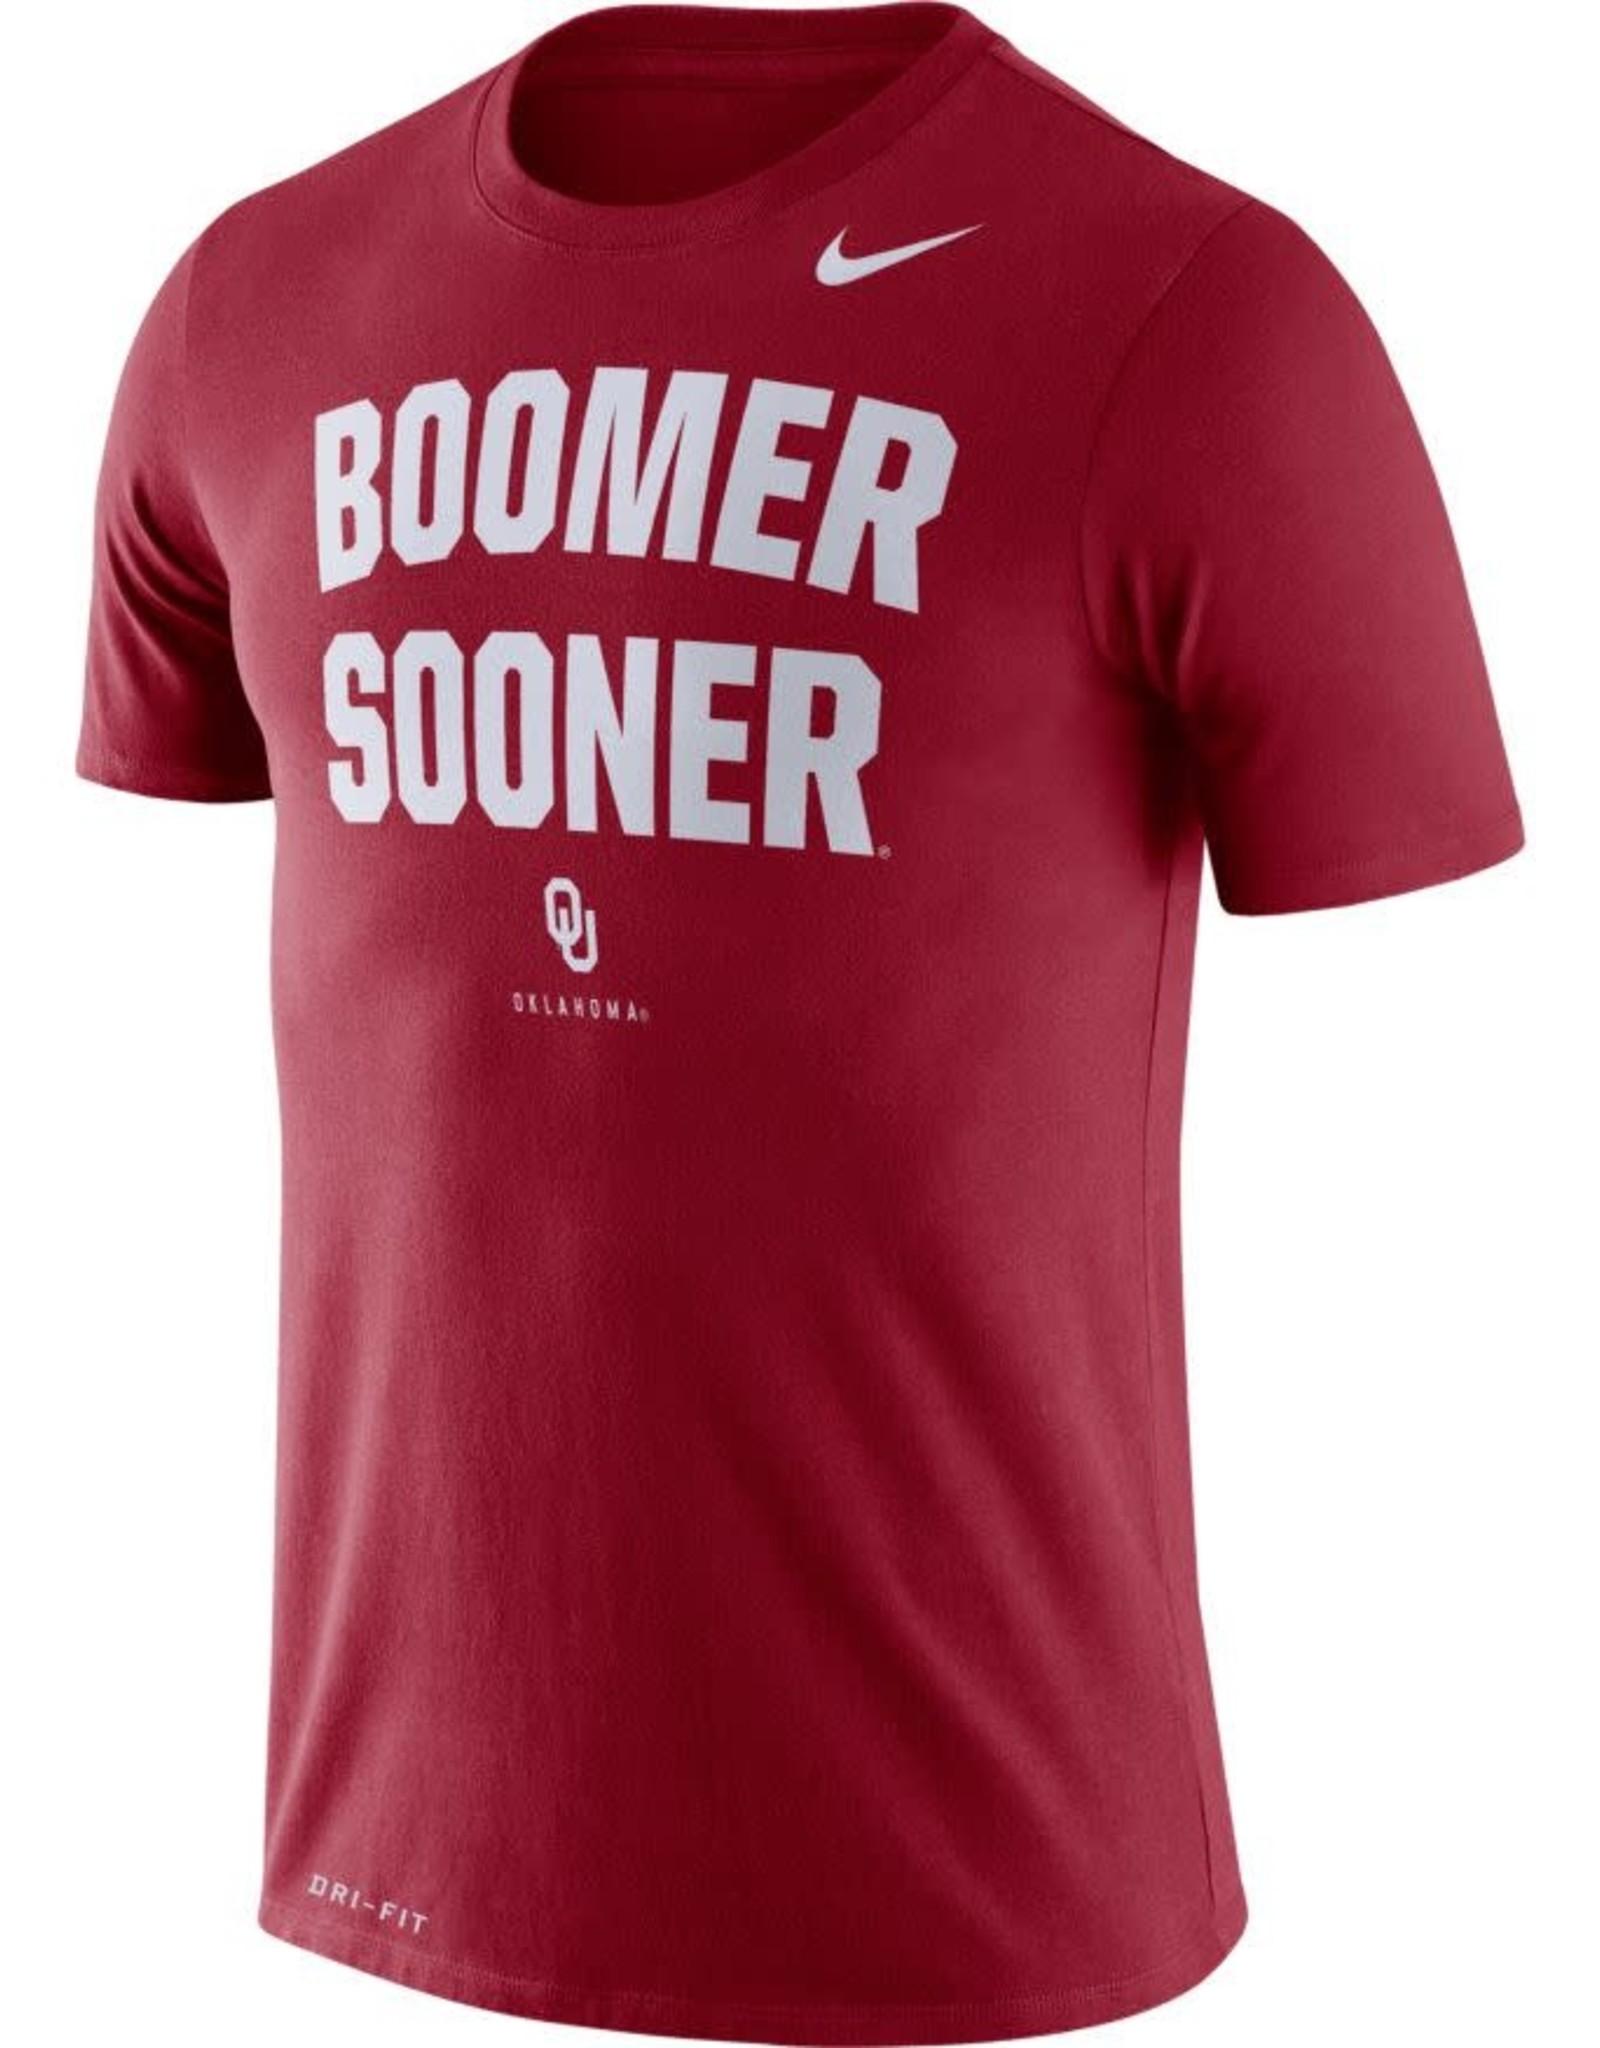 Nike Men's Nike Dri-Fit Cotton Boomer Sooner Phrase Tee Crimson